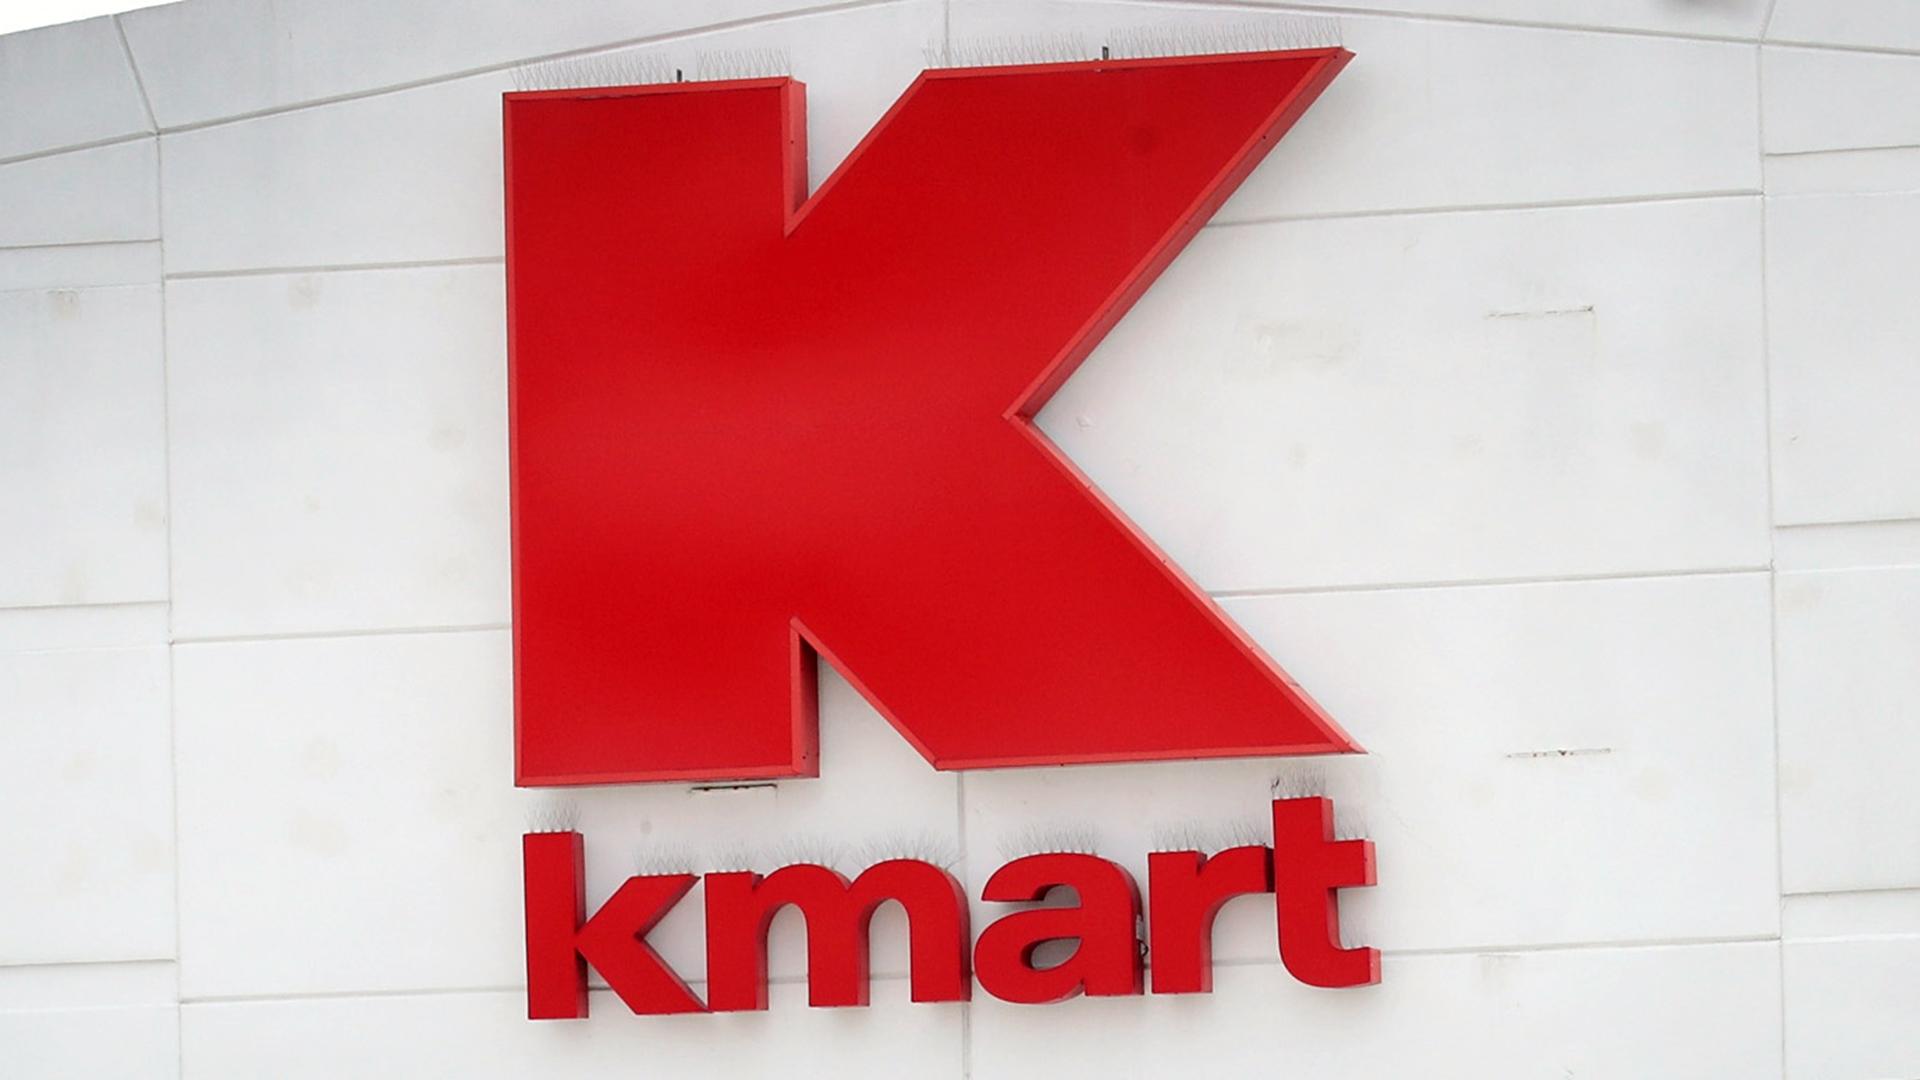 Mattydale KMart set to close by mid-December | WSYR